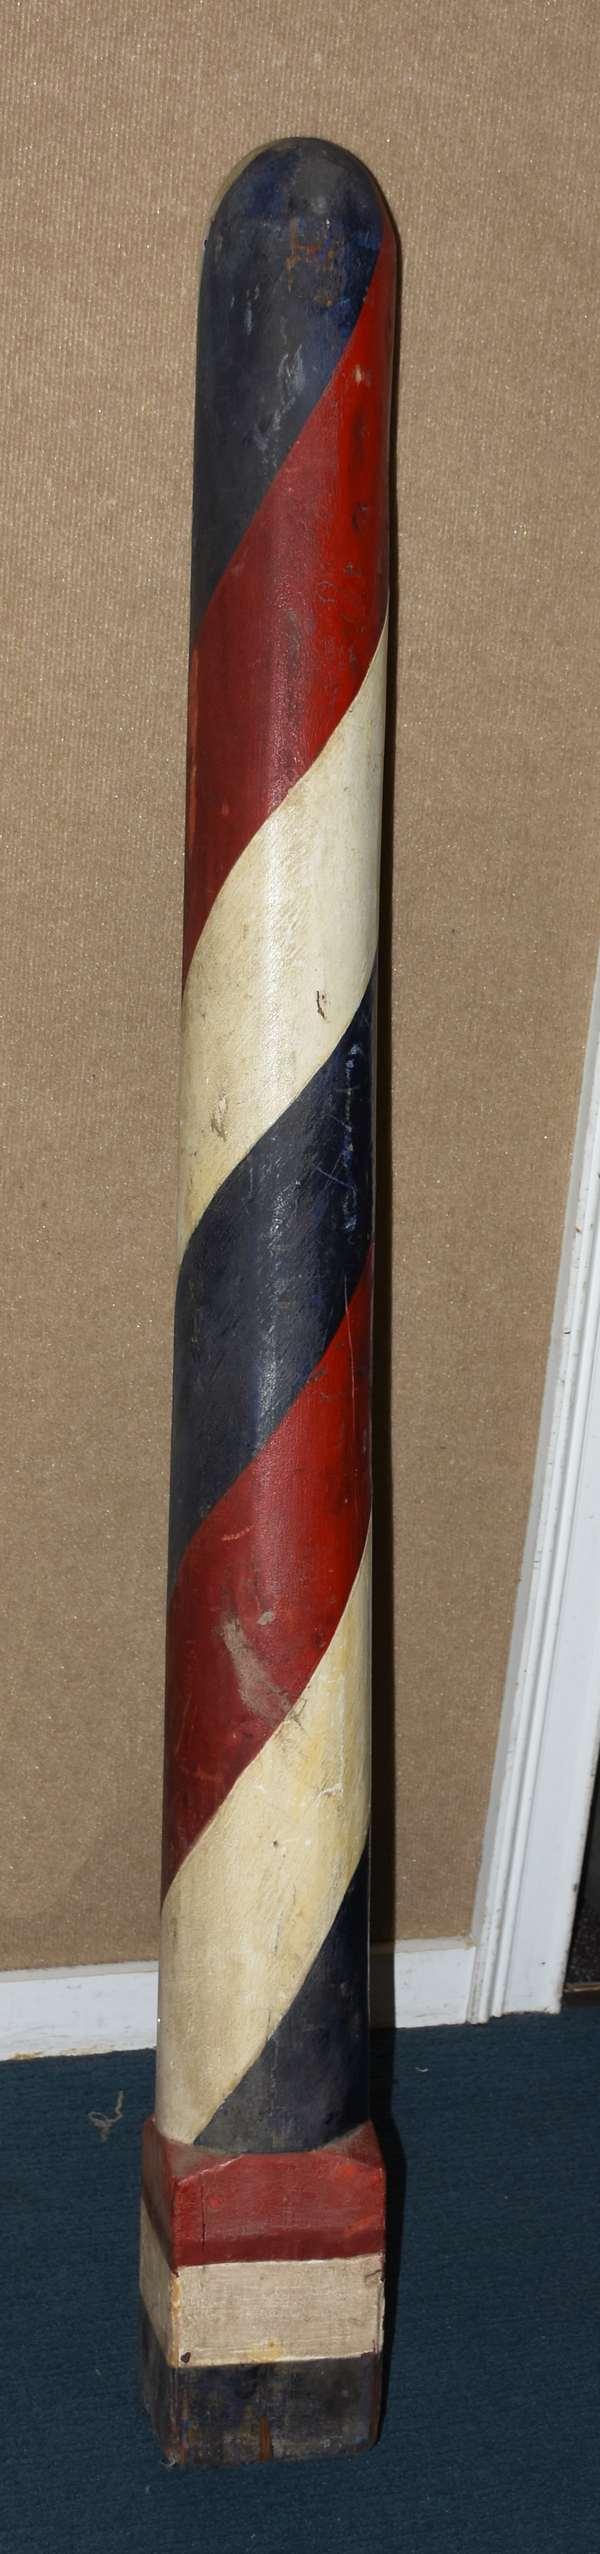 Antique barber's pole, 5'H. (105-65)